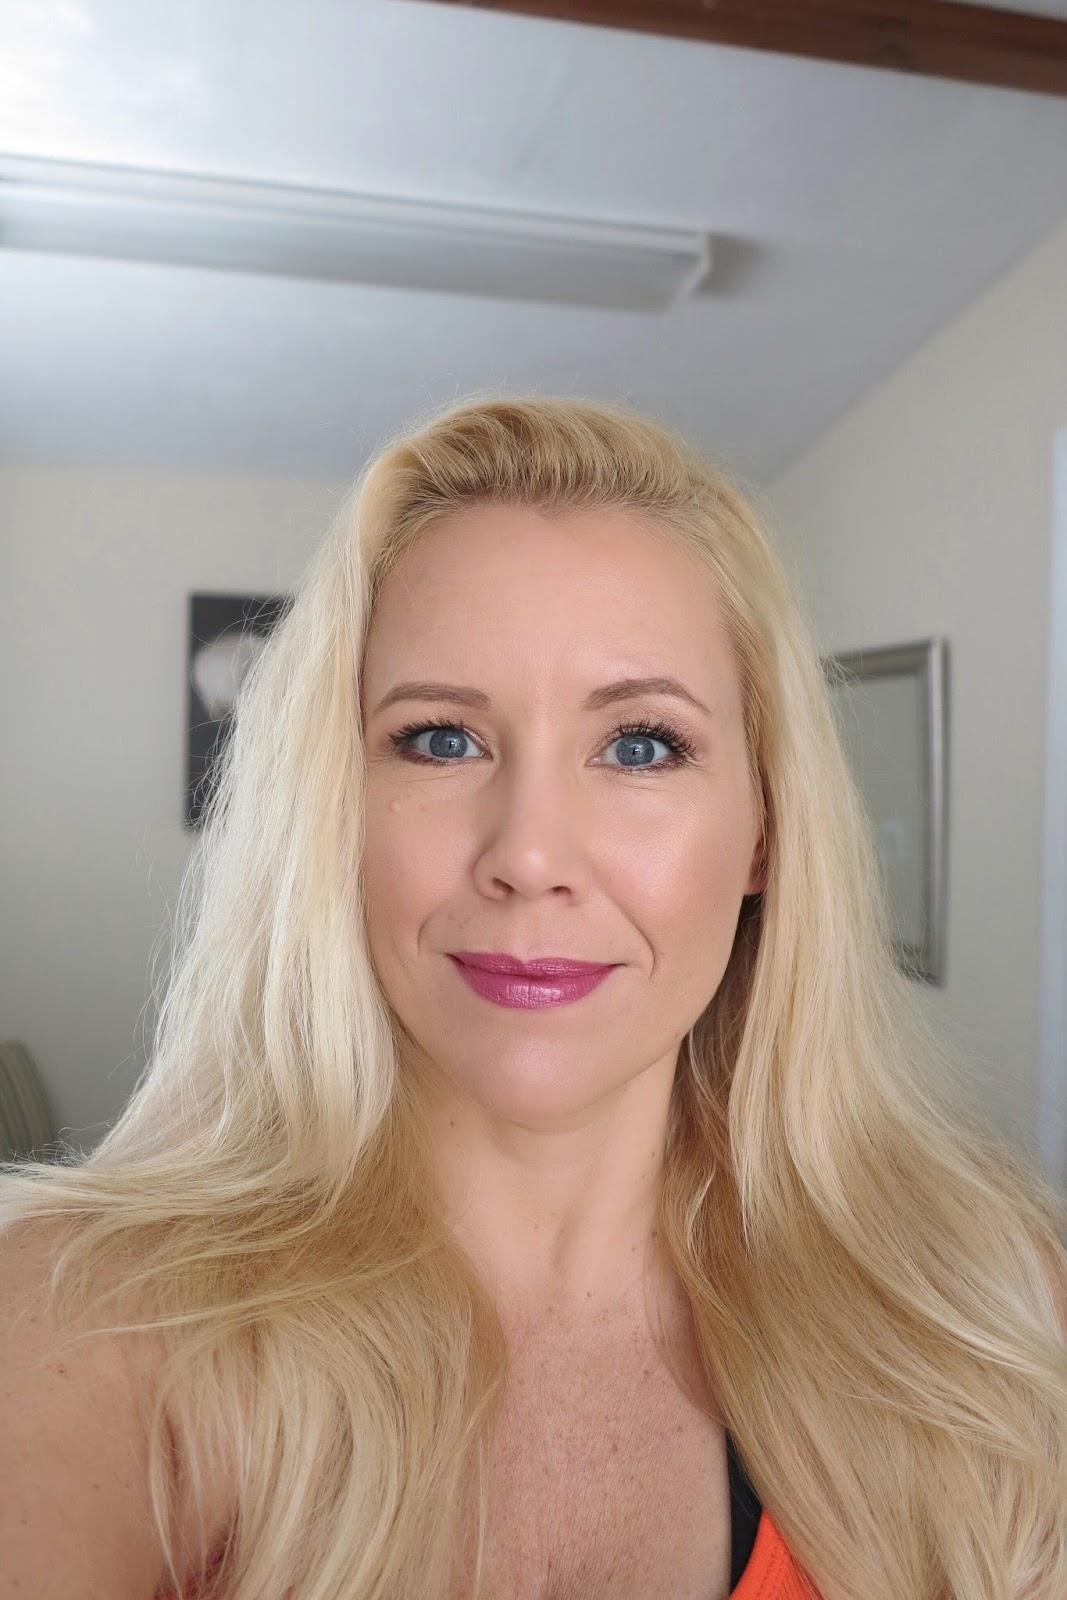 LAURA GELLER BAKED BEAUTY 101 REVIEW & MAKEUP LOOK